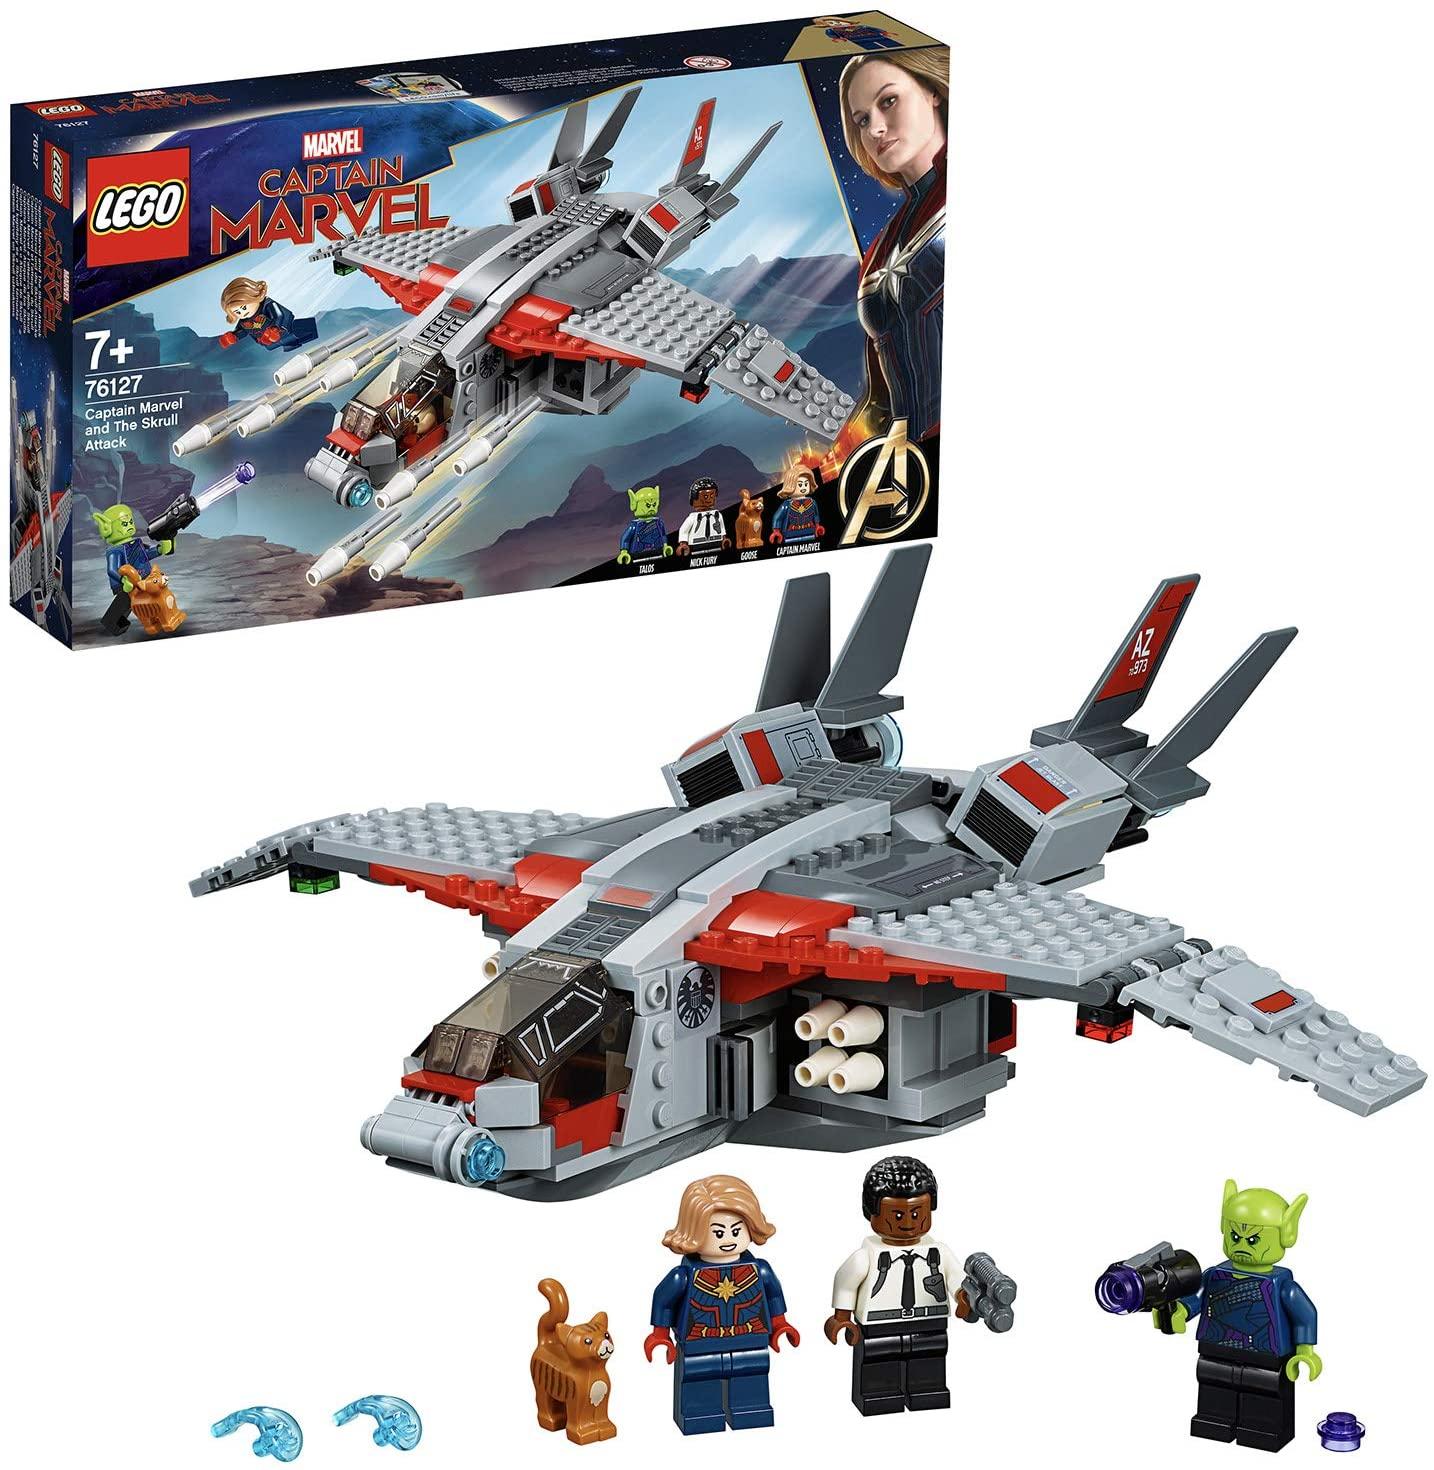 LEGO 76127 Captain Marvel and The Skrull Attack Building Kit £22.70 delivered @ Argos